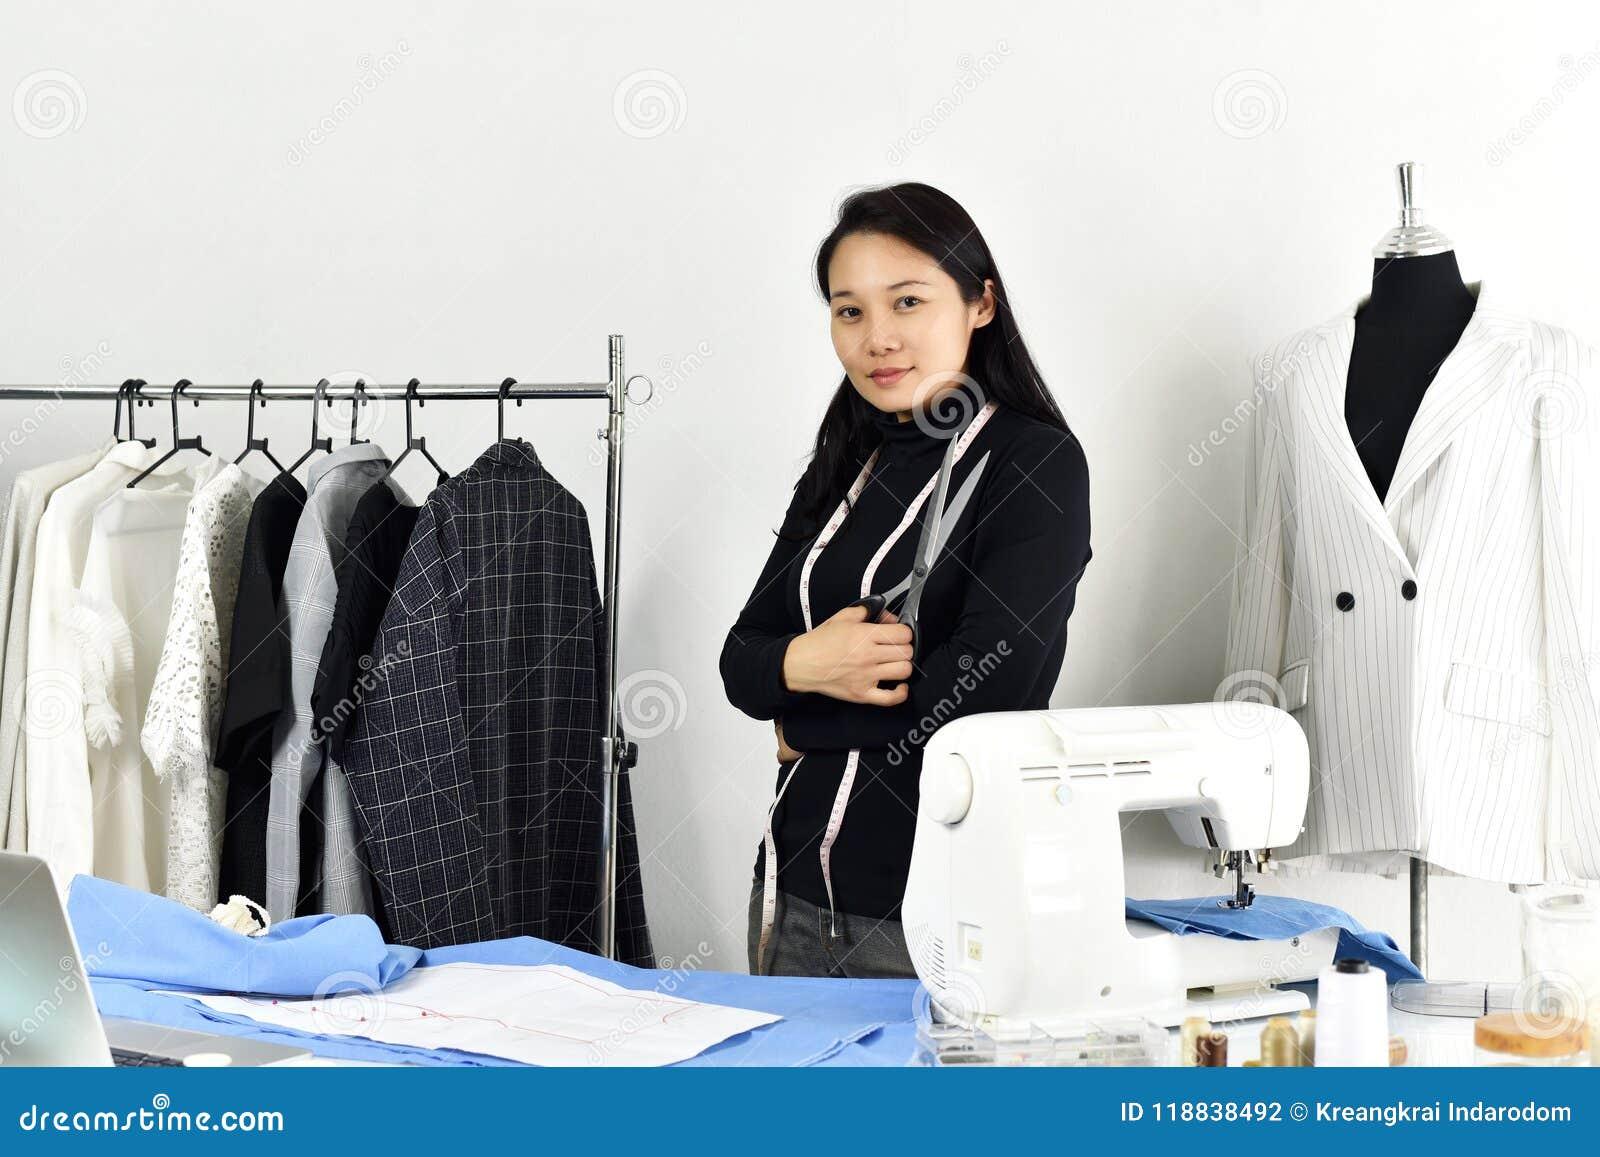 Female Fashion Designer Working At Studio Stock Image ...